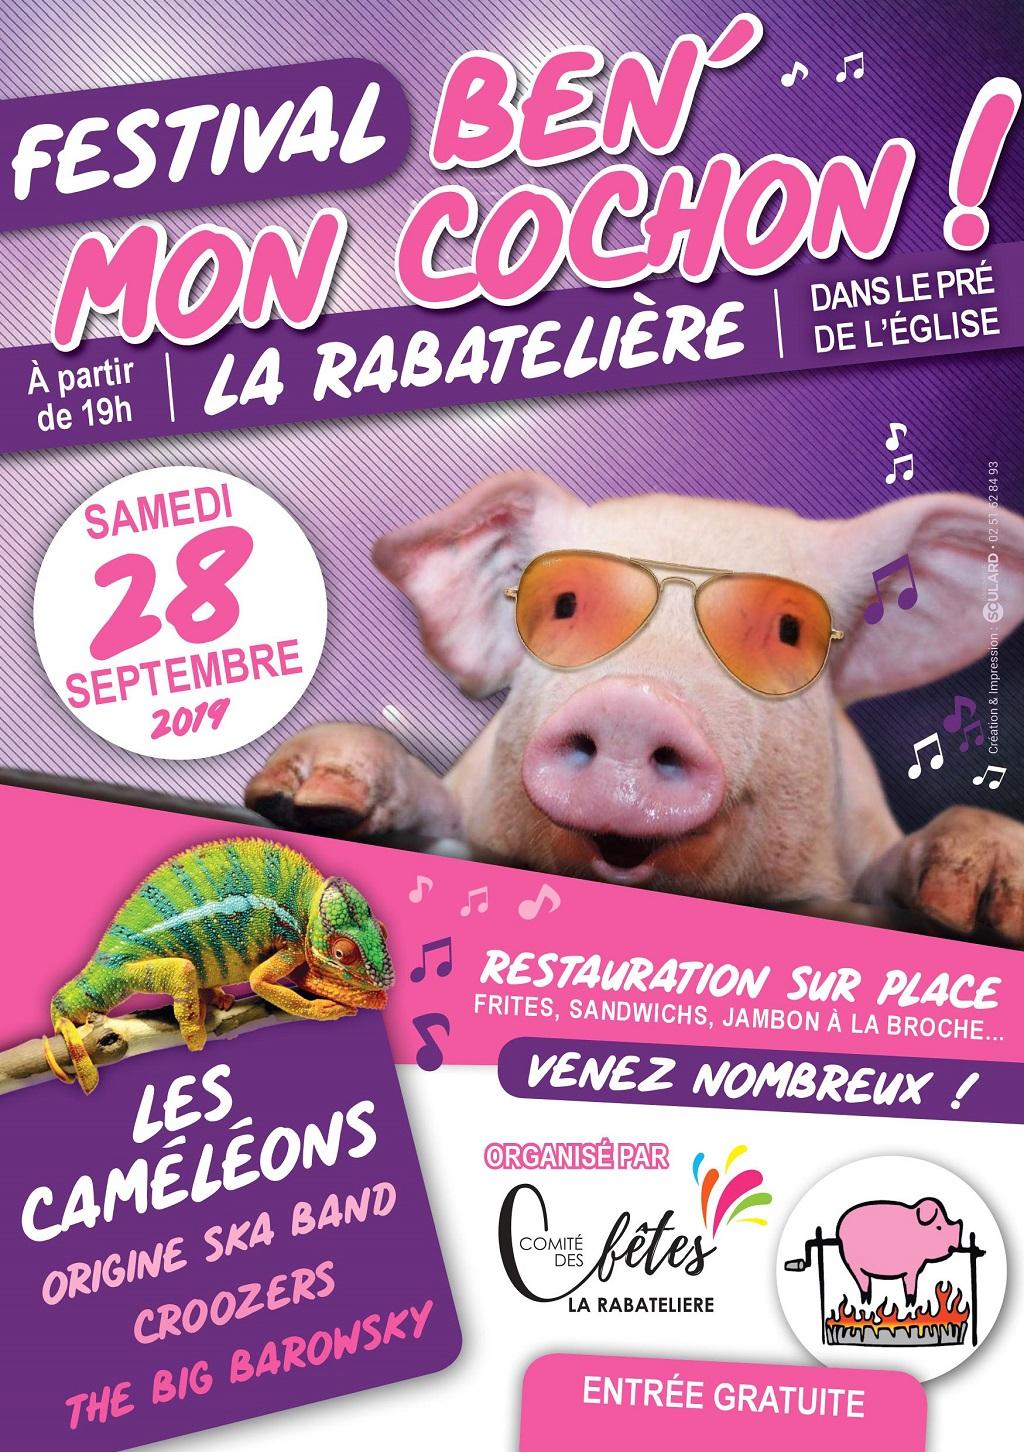 festival-benmoncochon-larabateliere-85-fma